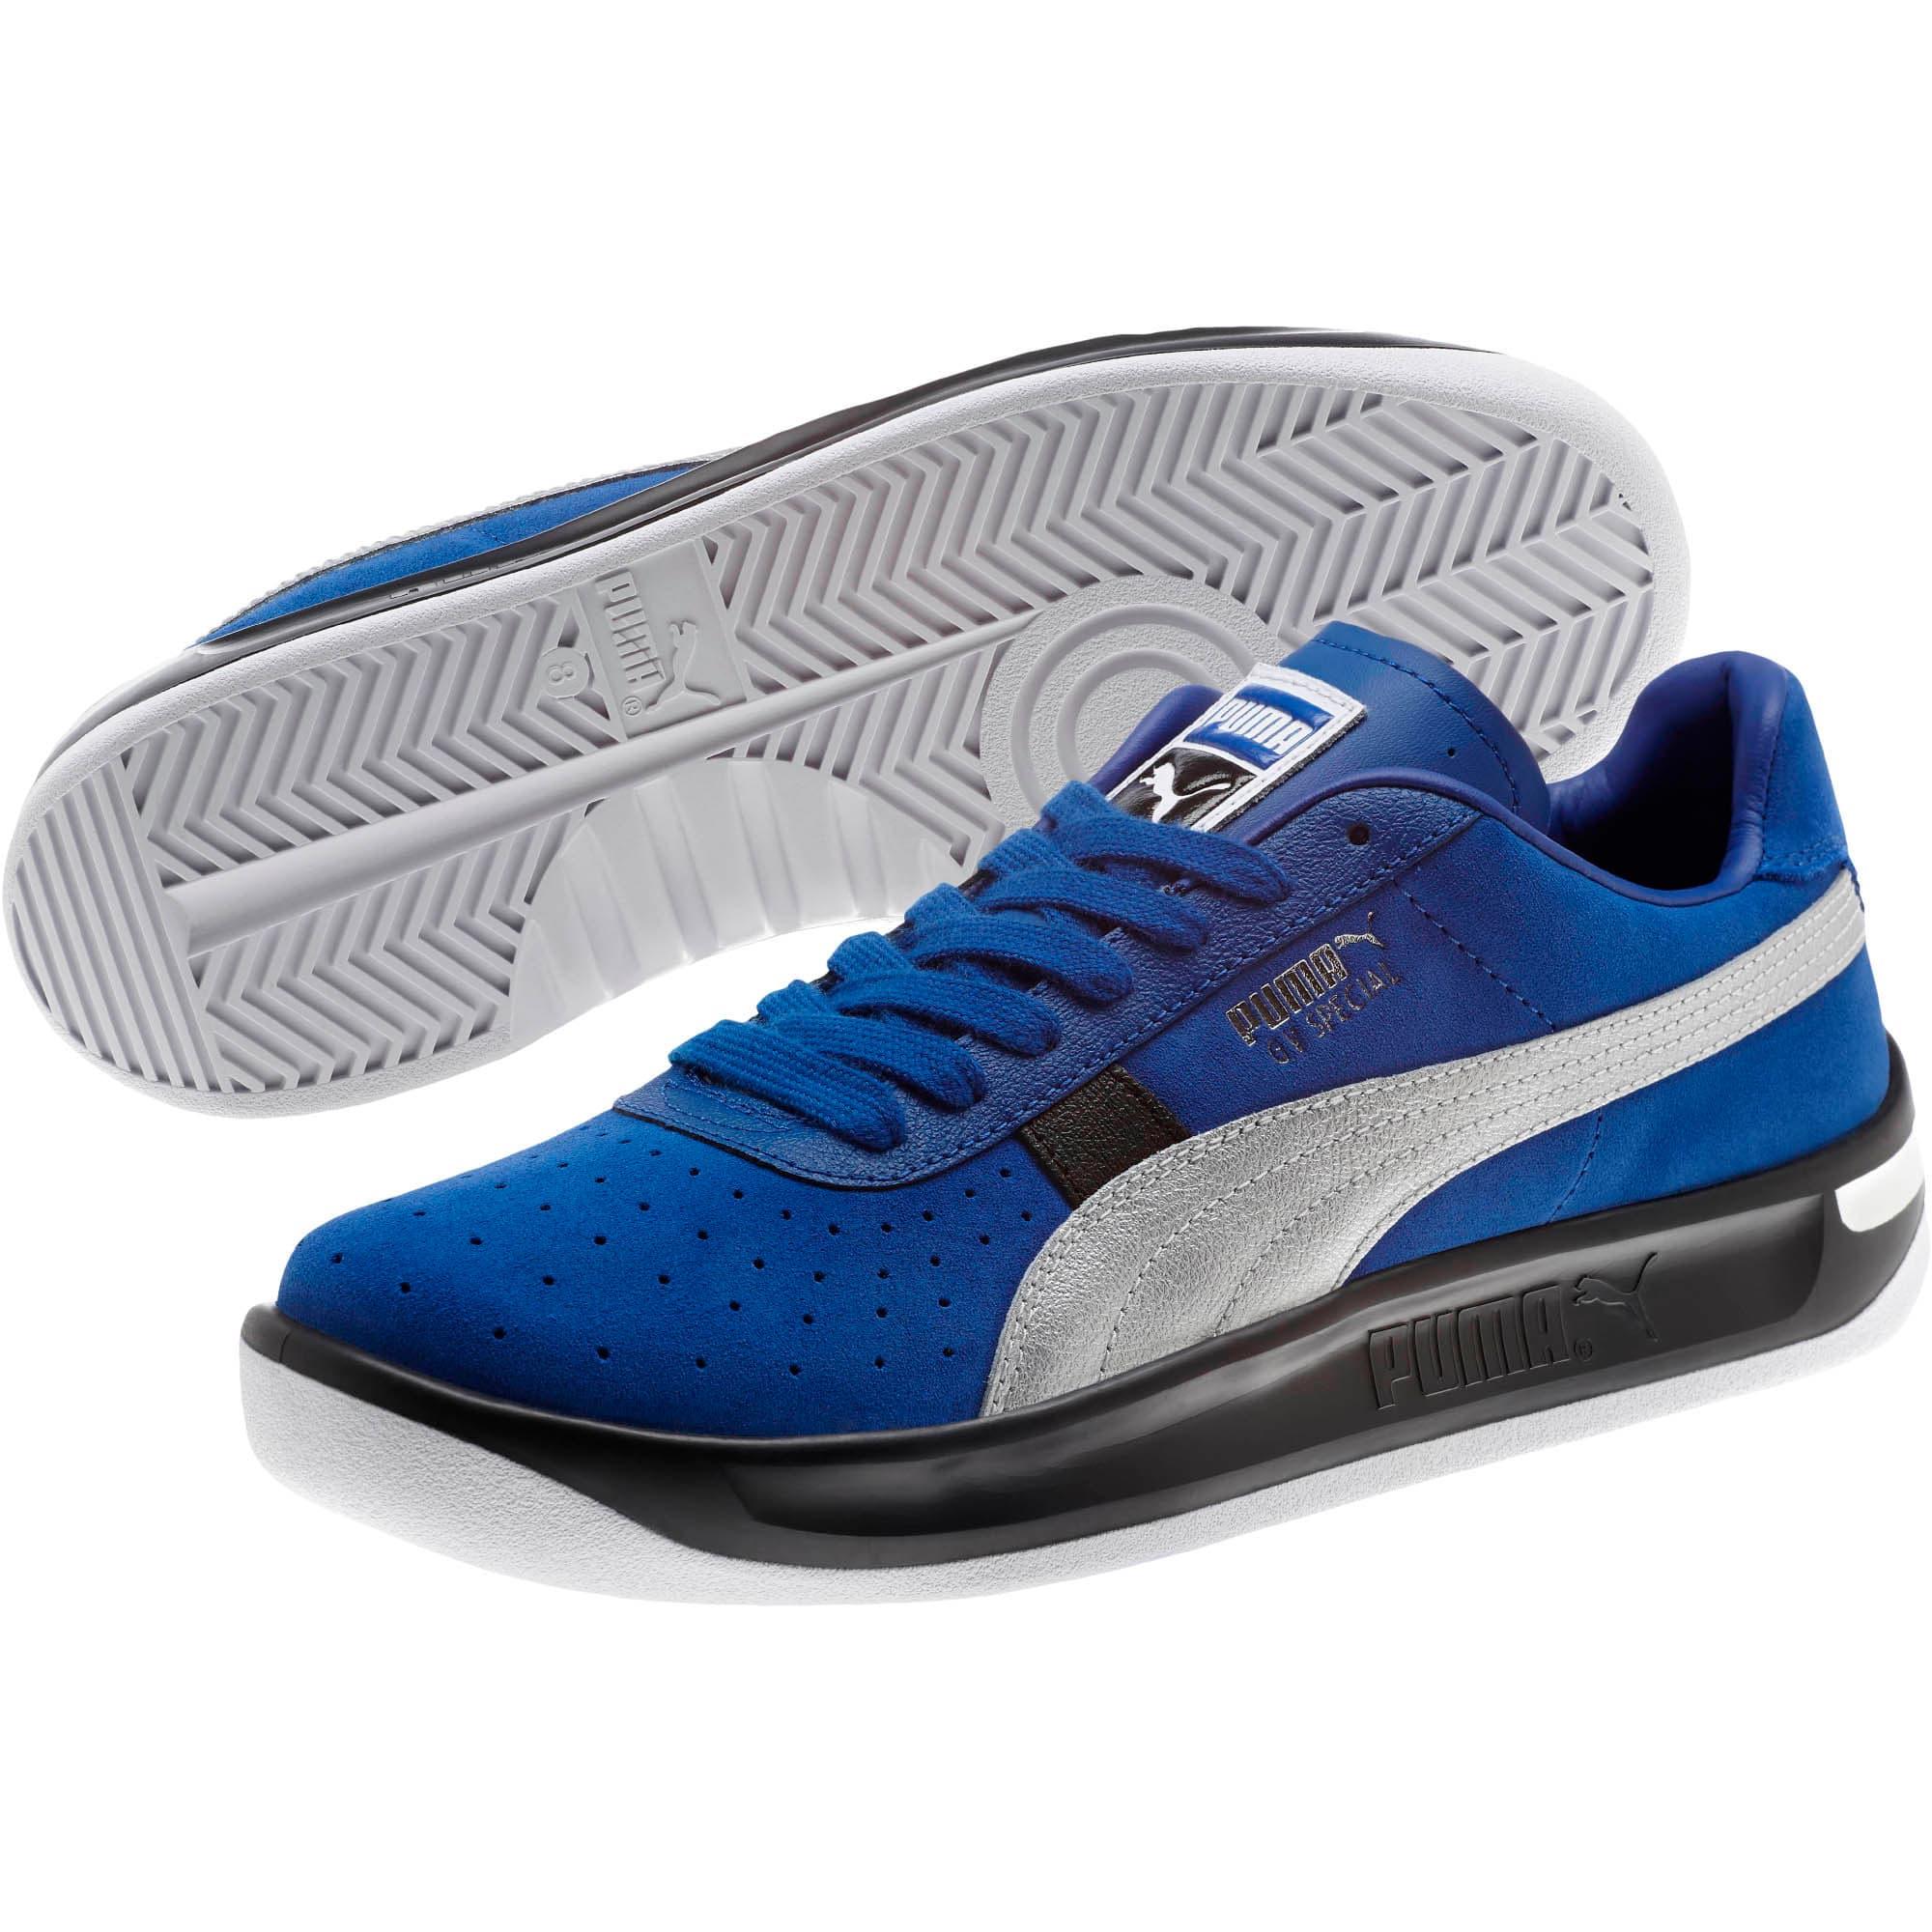 Miniatura 2 de Zapatos deportivos GV Special Speedway VL de hombre, Surf The Web-Puma Silver, mediano